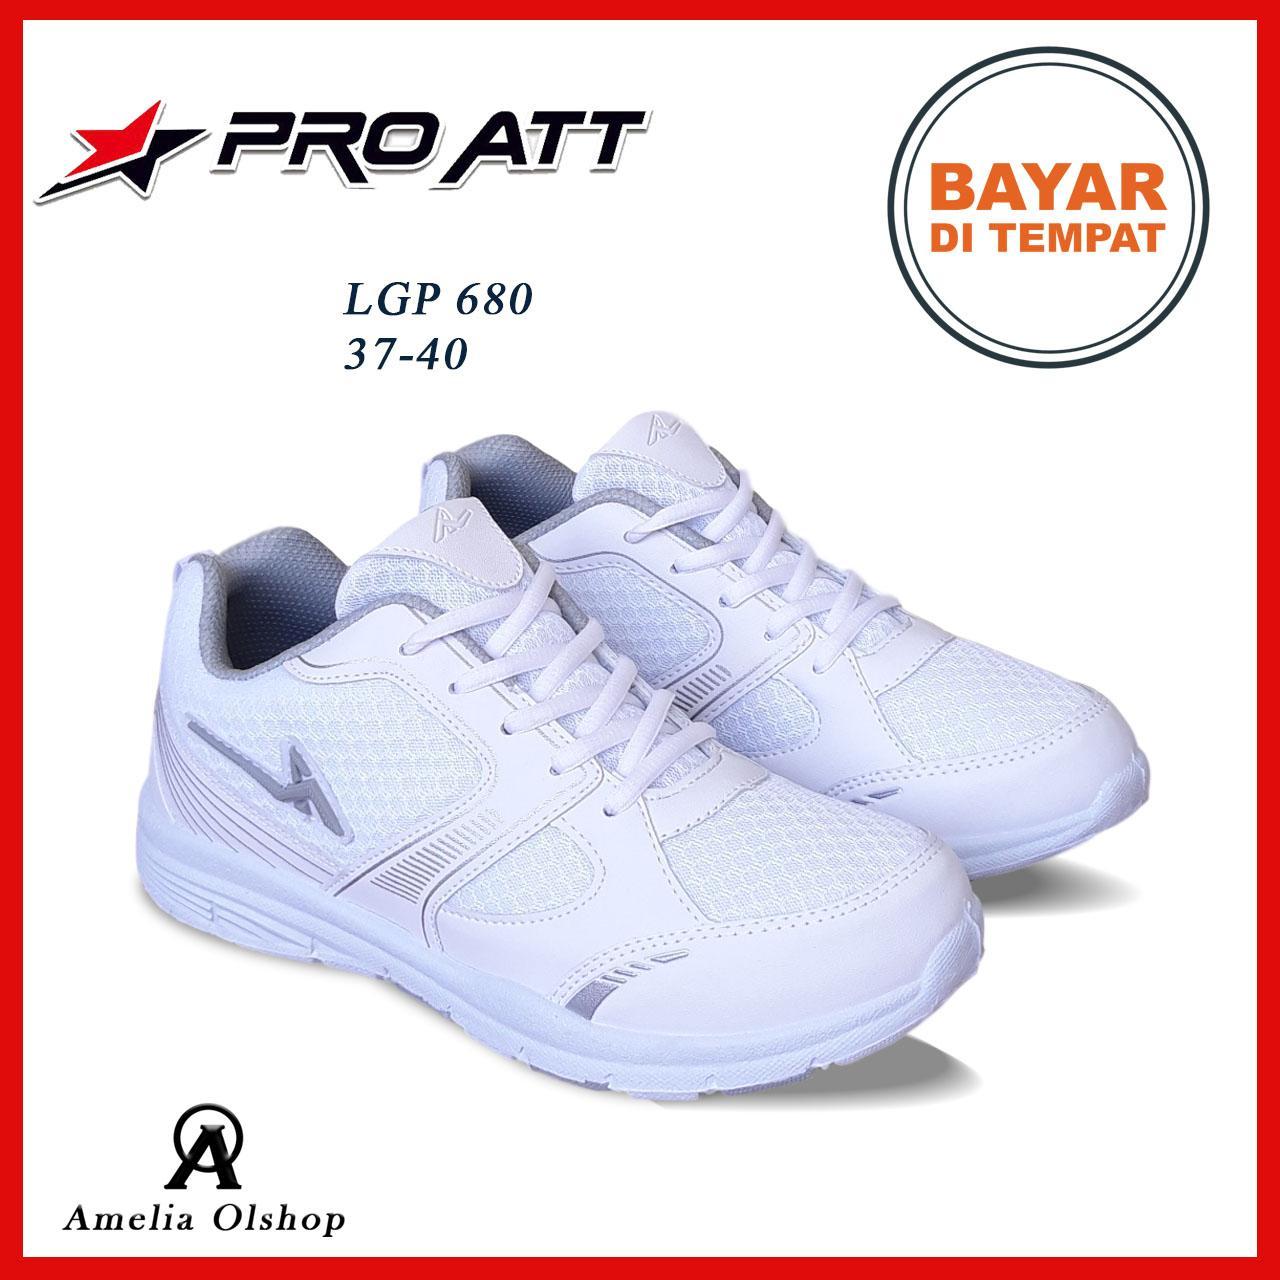 Amelia Olshop - Sepatu Pro ATT LG 37-40   Sepatu Wanita   Sepatu Sneakers 76671162d8